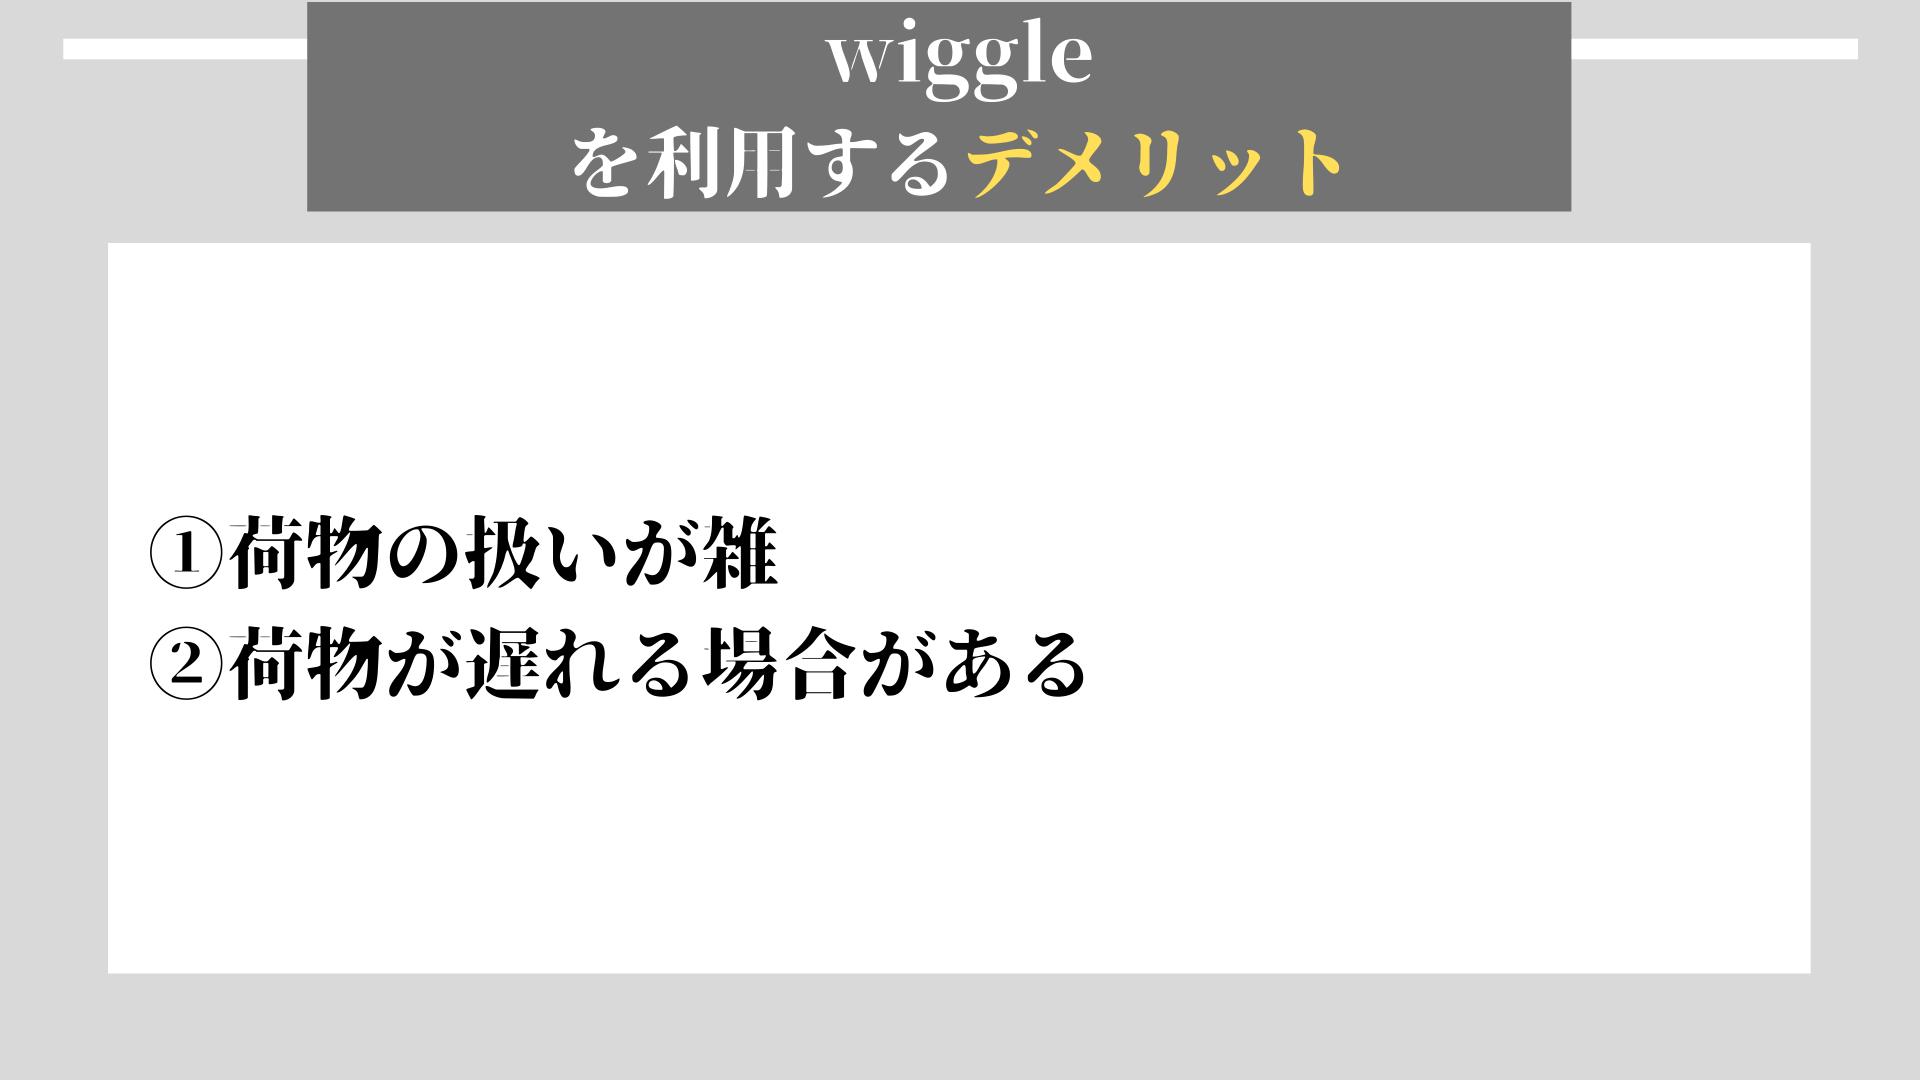 wiggle デメリット